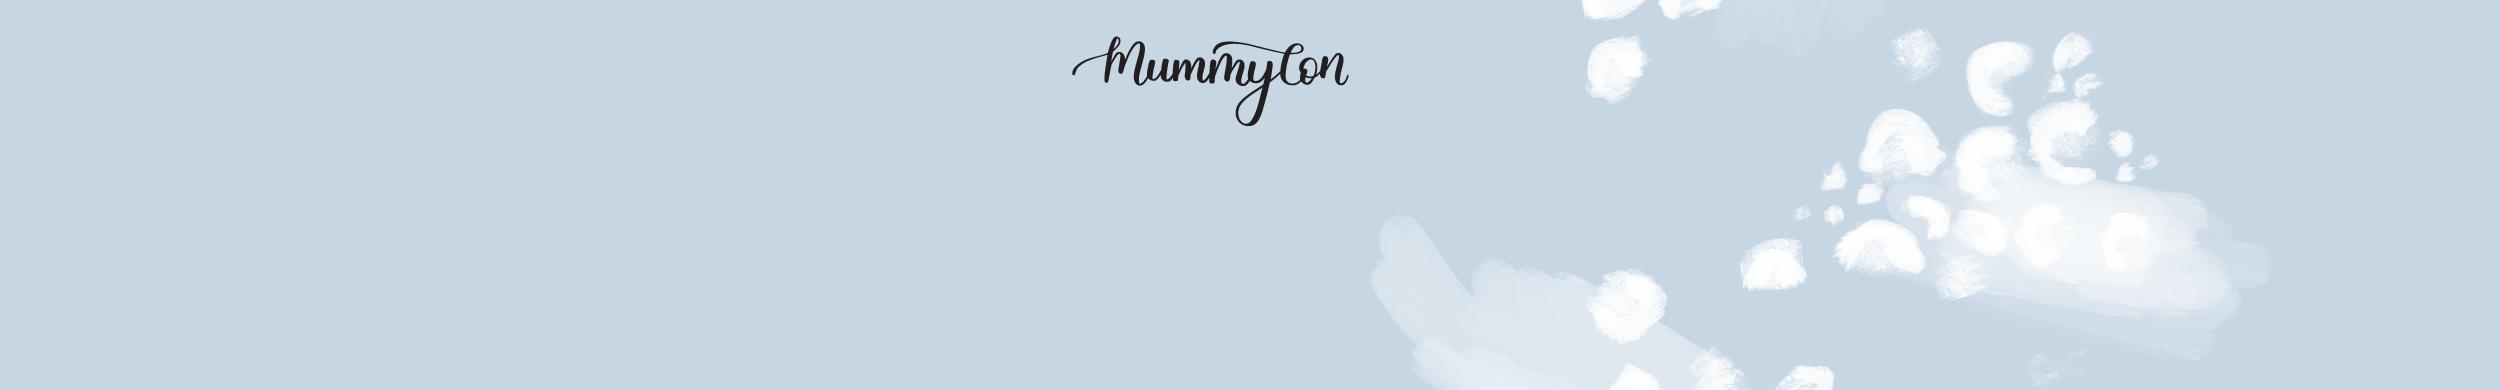 MummyCon_WebFooter.png